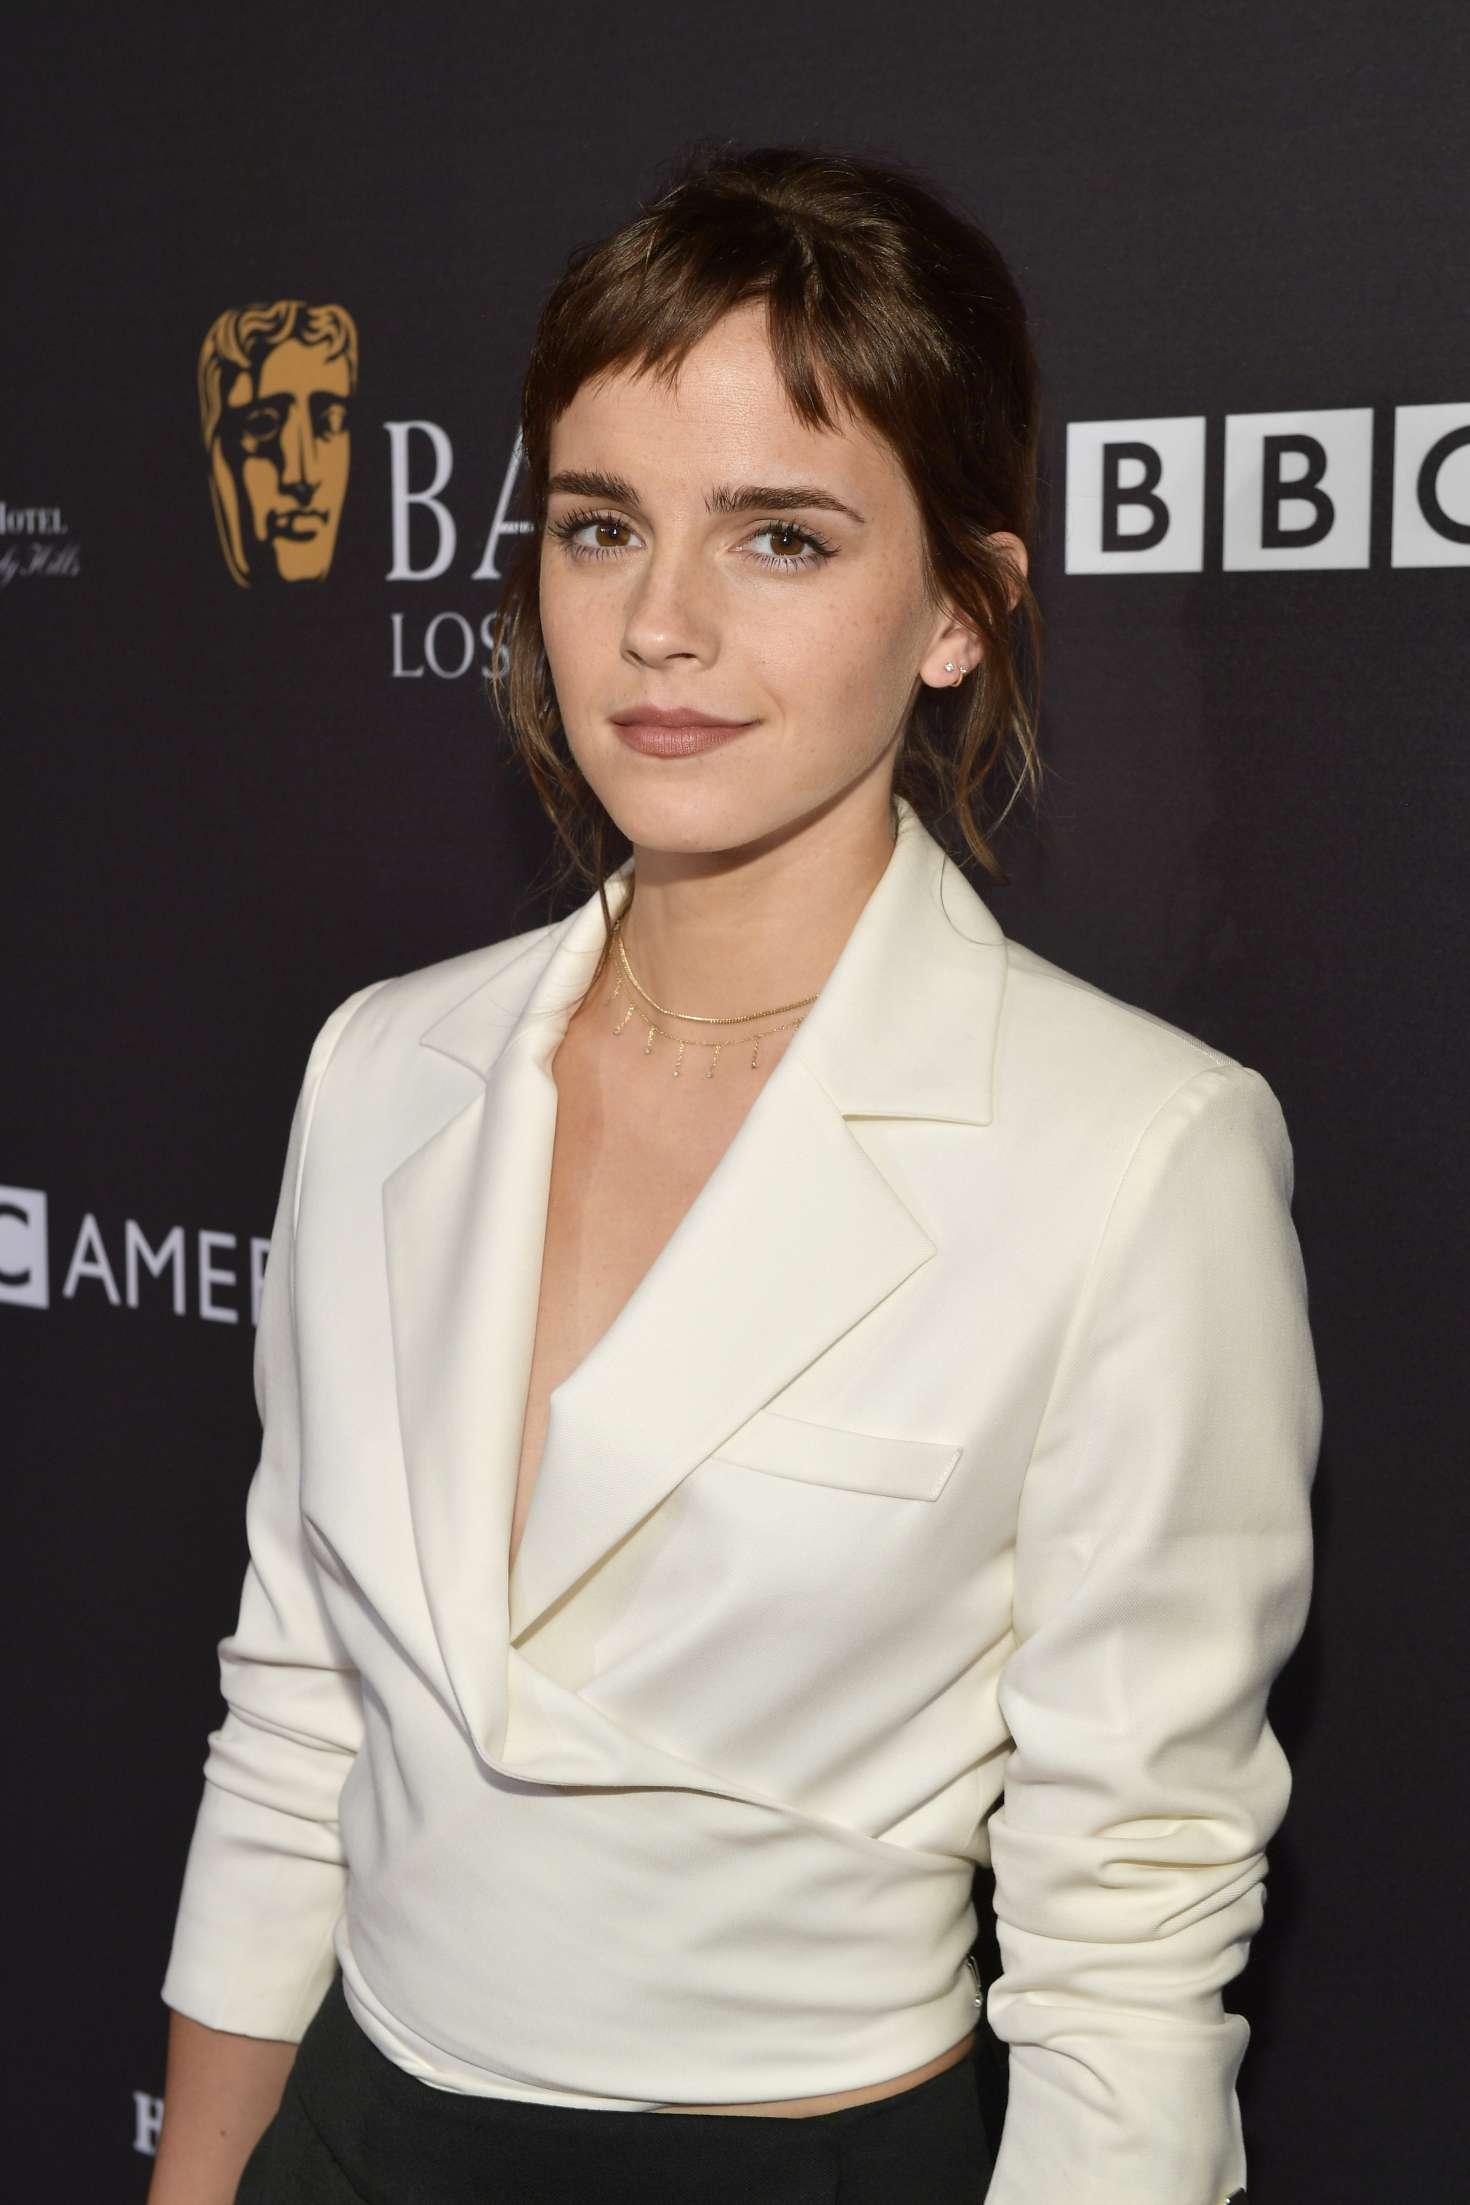 Vanessa Hudgens Cute Wallpaper Emma Watson 2018 Bafta Los Angeles Tea Party In Los Angeles